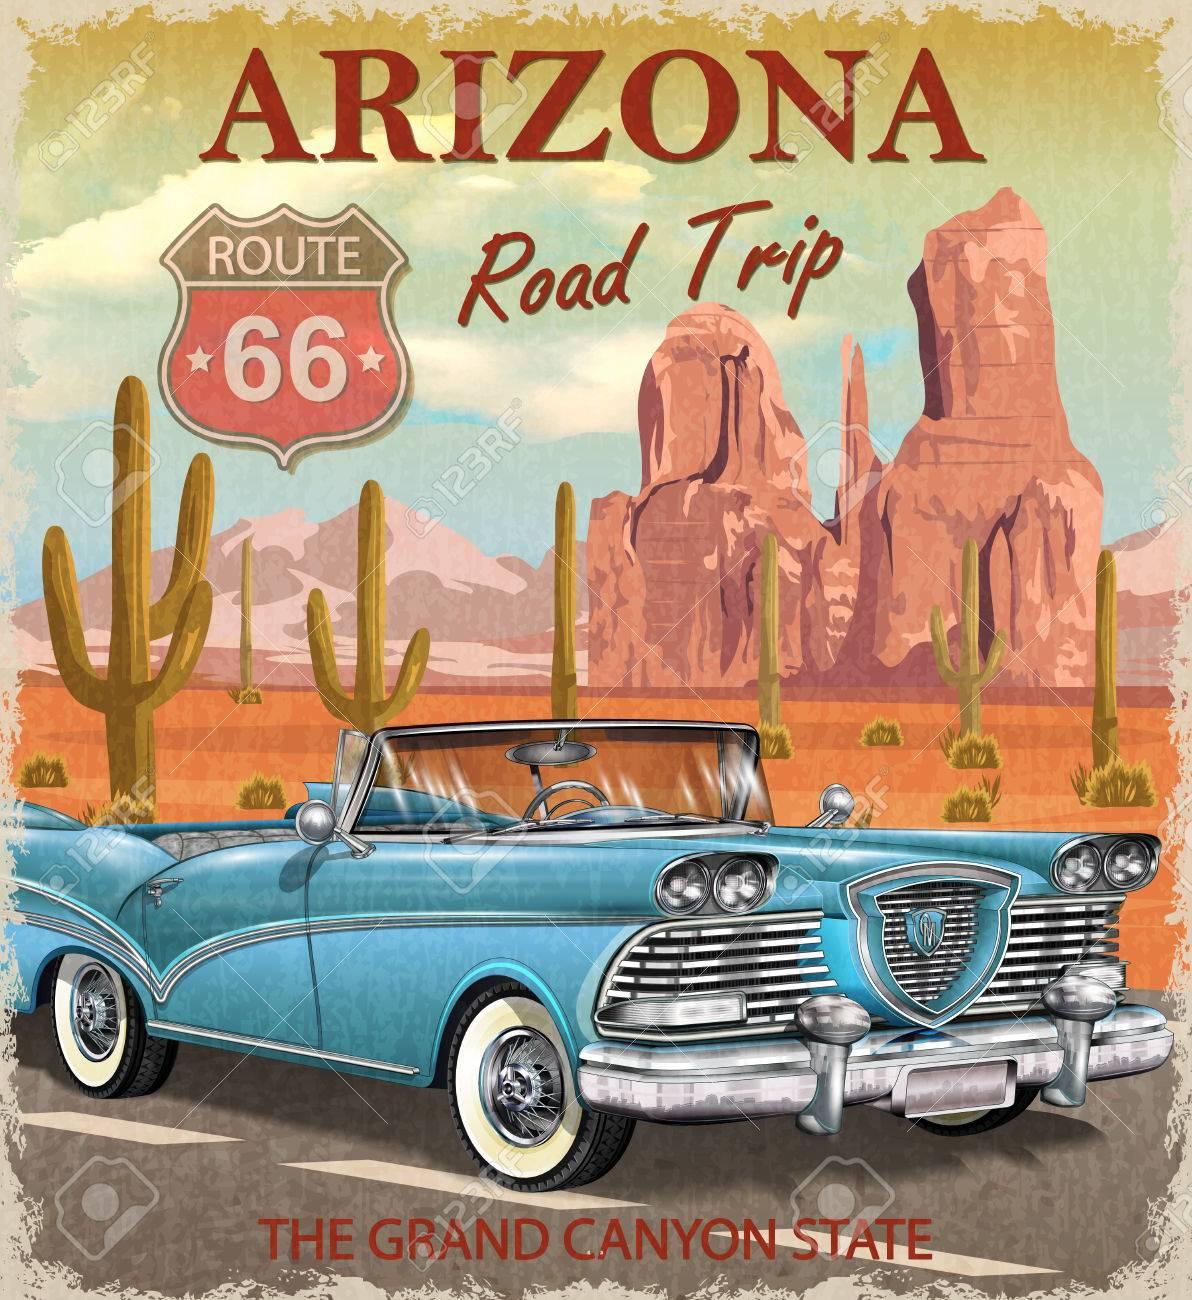 Vintage Arizona road trip poster. - 85234071